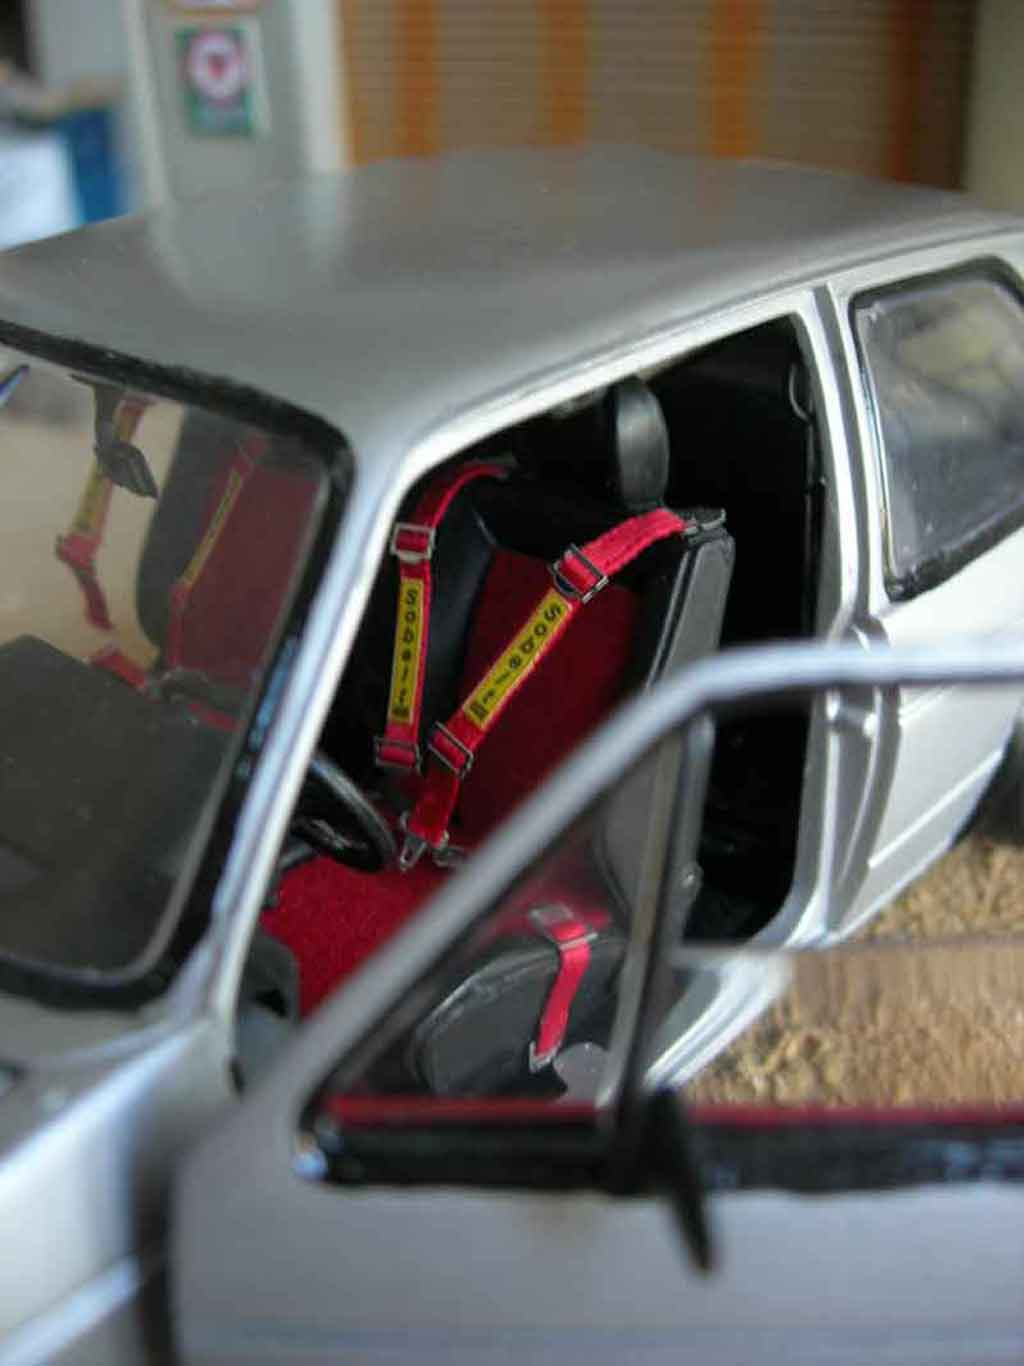 Voiture de collection Volkswagen Golf 1 GTI jantes Porsche rs tuning Solido. Volkswagen Golf 1 GTI jantes Porsche rs German Look miniature 1/18